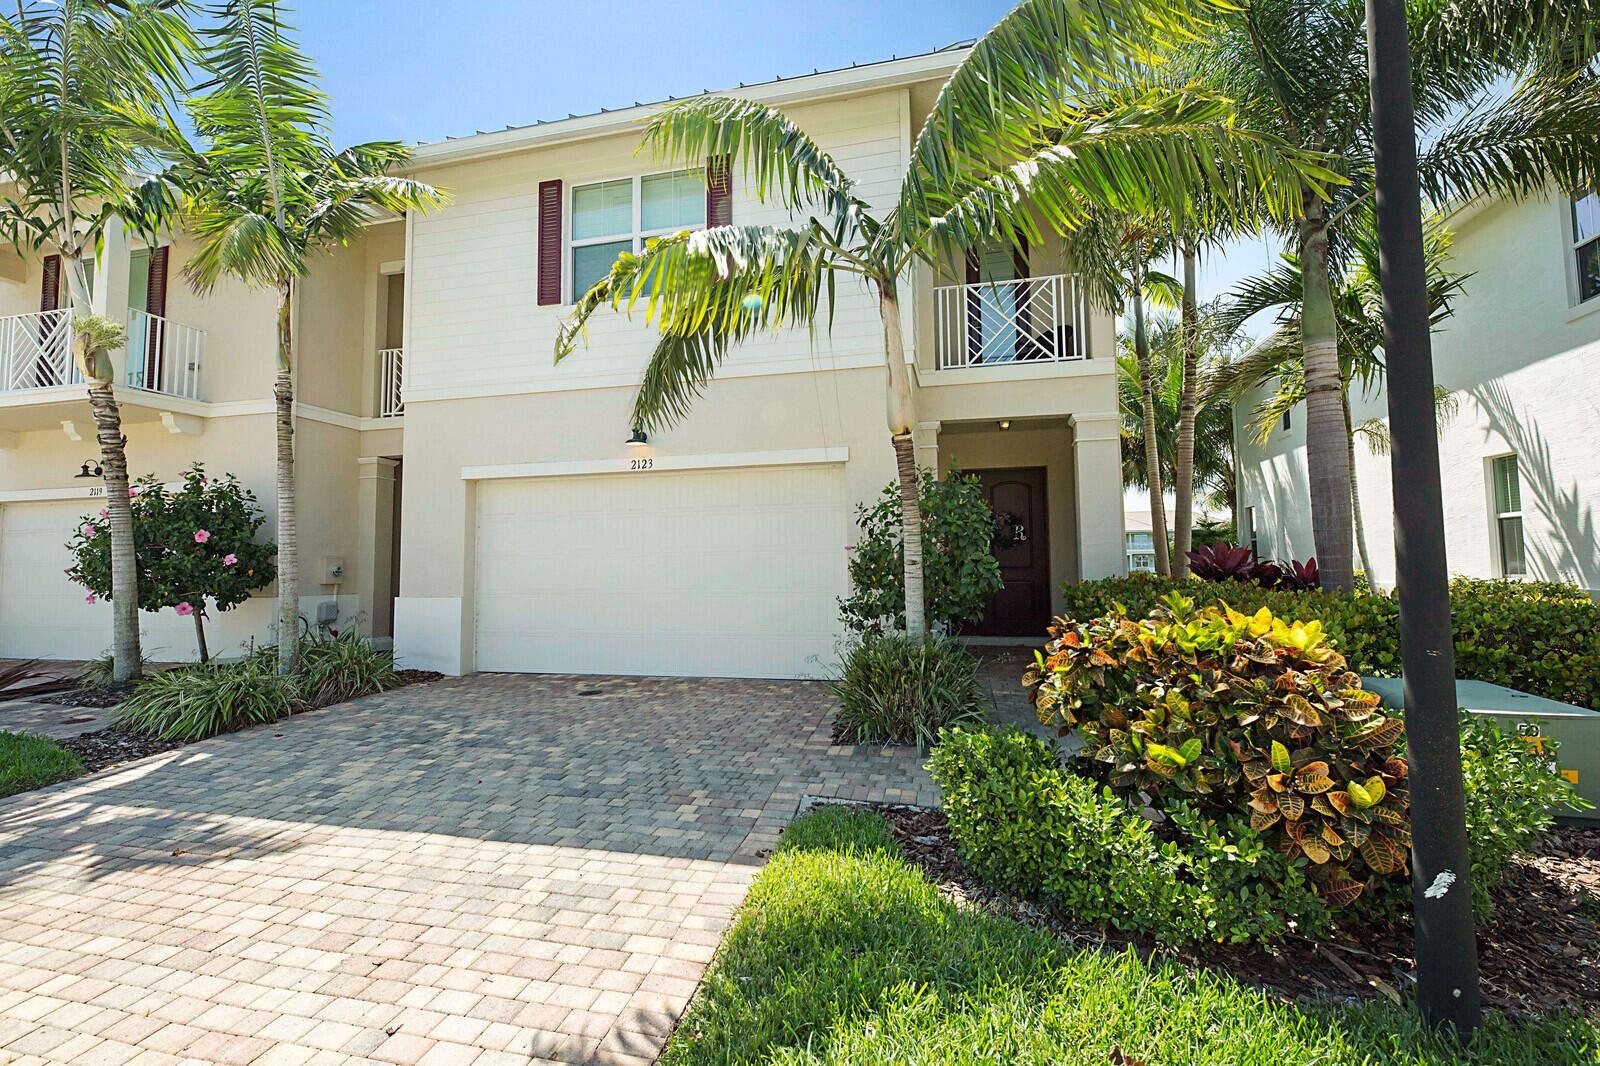 Photo of 2123 Wells Place, Palm Beach Gardens, FL 33418 (MLS # RX-10709165)